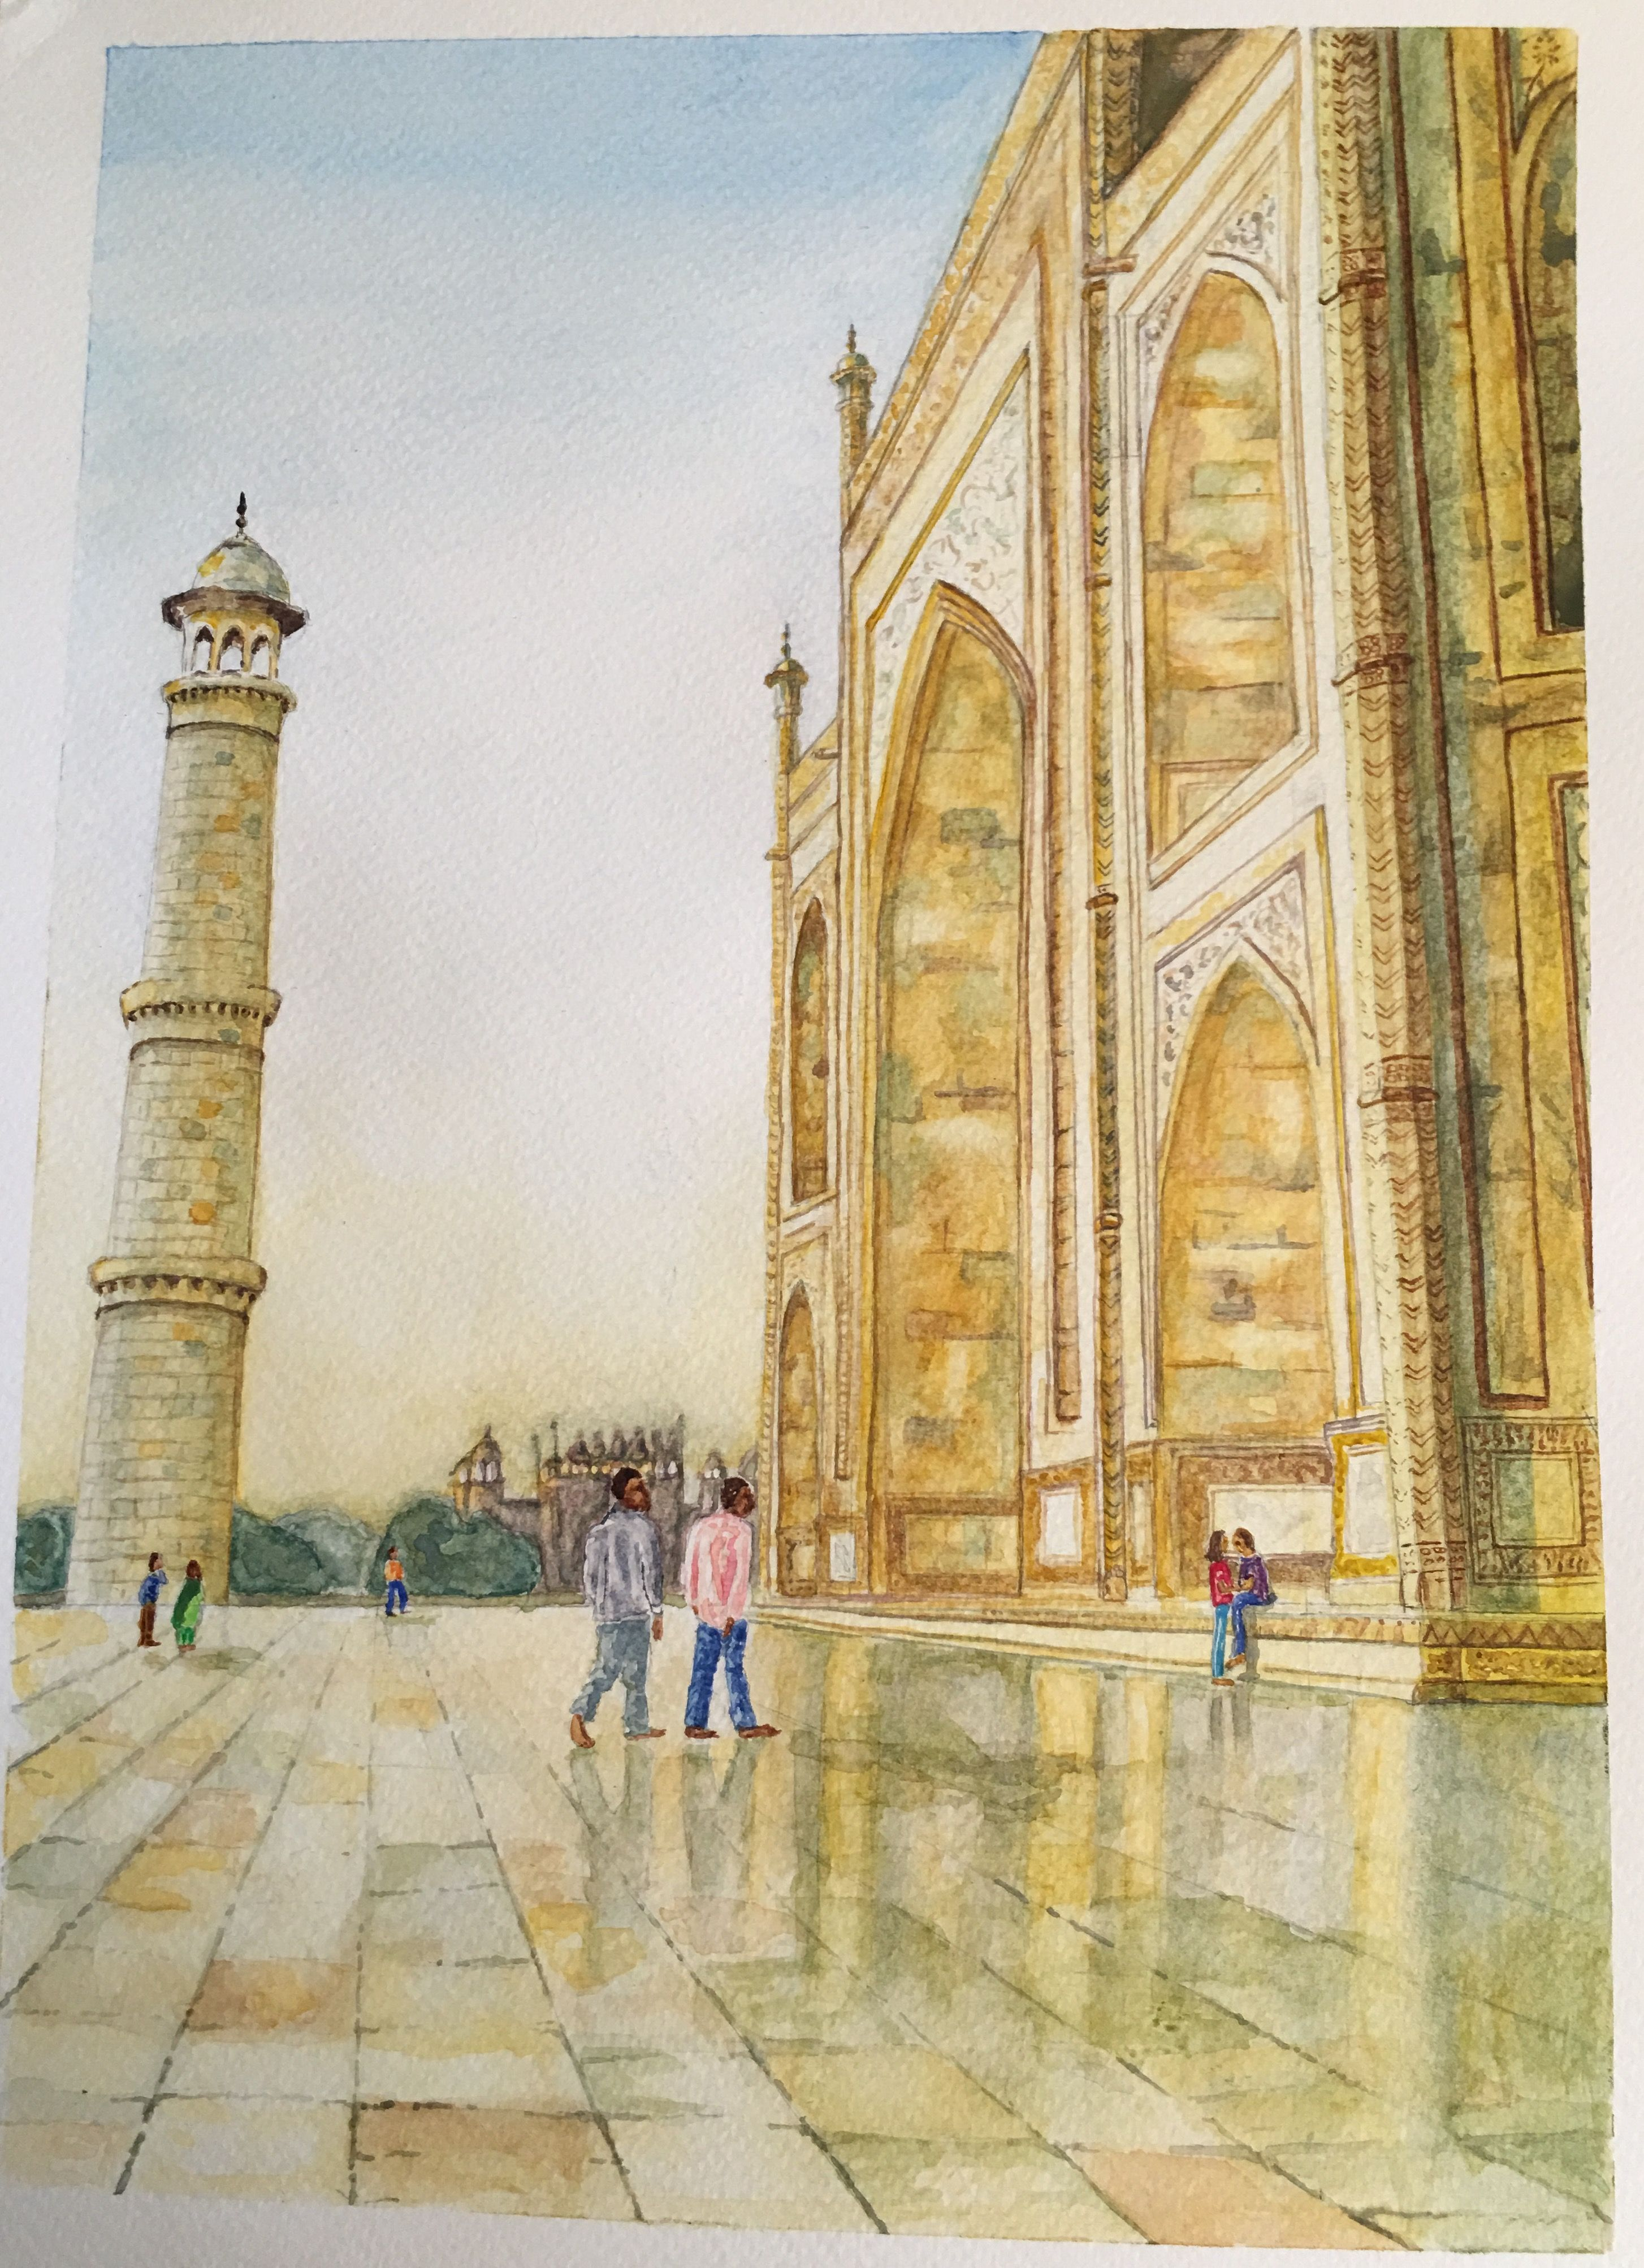 Magnificent Taj Mahal Wall Art Gift - Wall Art Collections ...